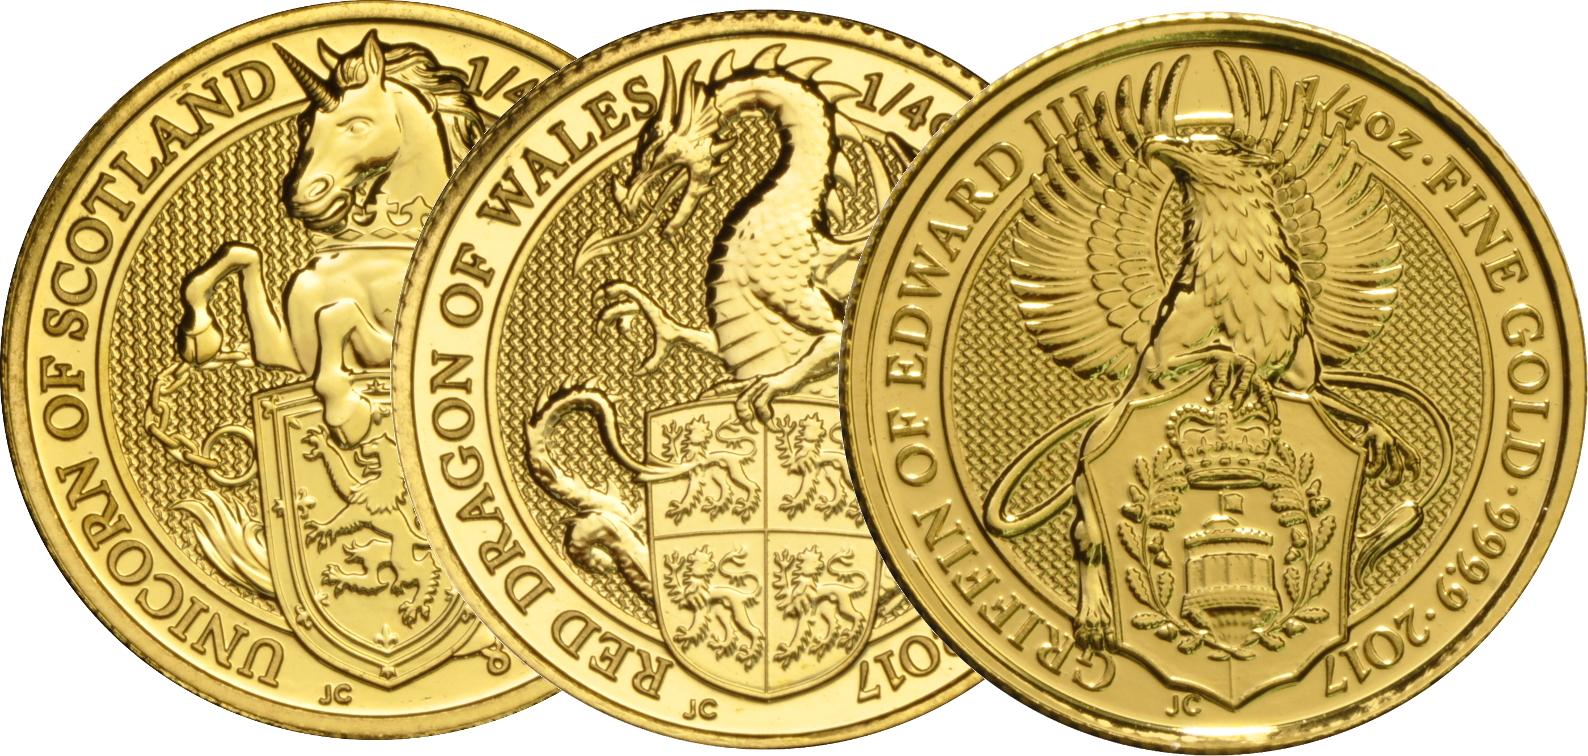 1/4oz Royal Mint Lunar Beasts Series £25 Gold Coins